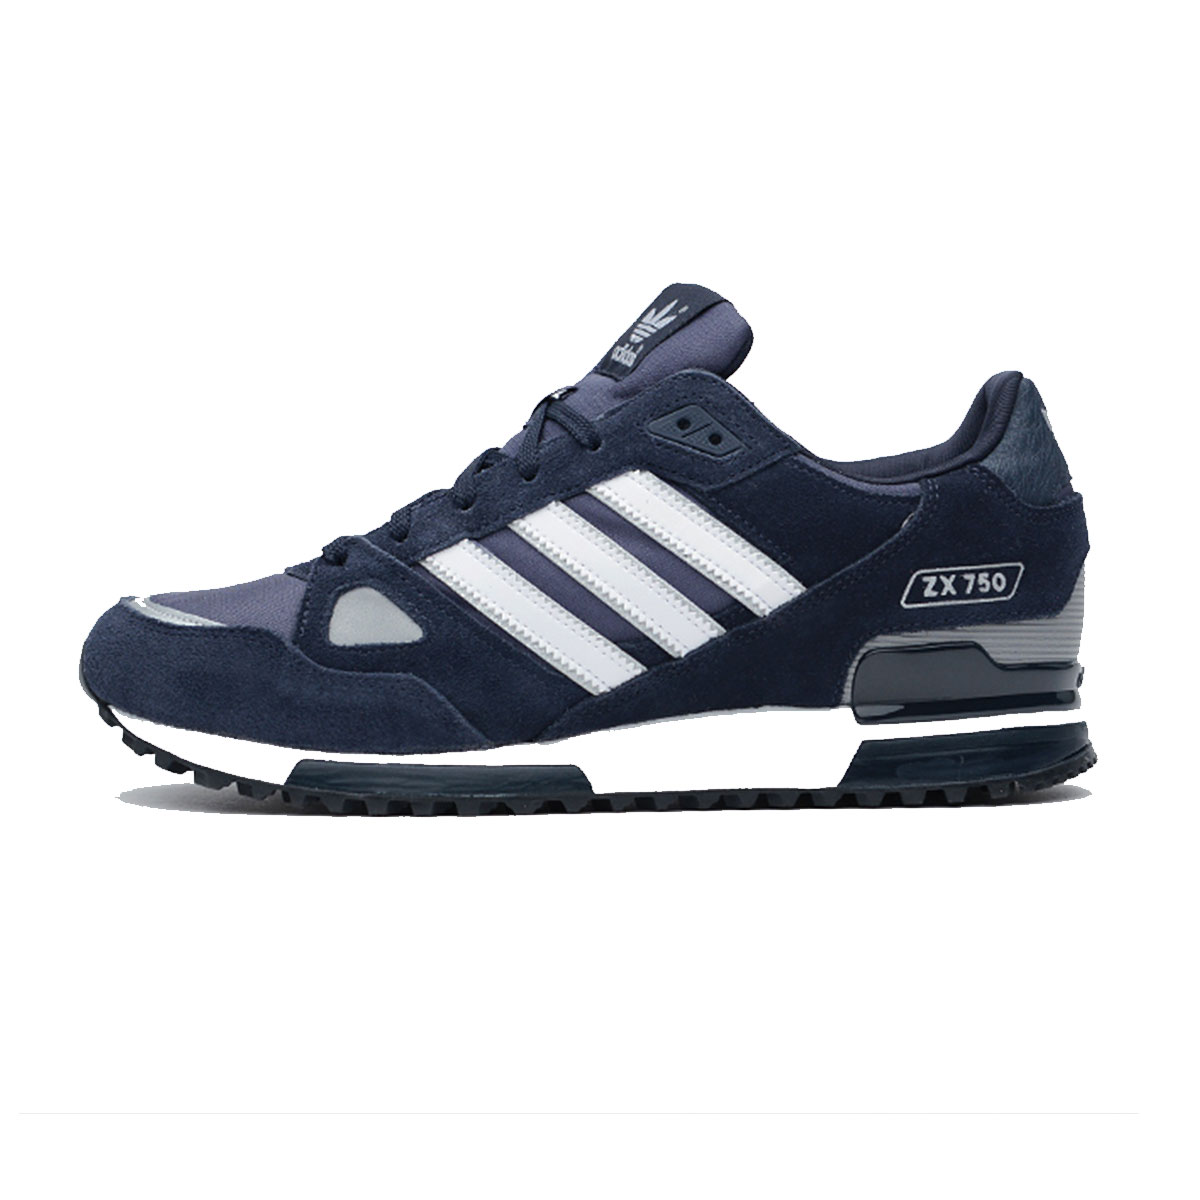 adidas zx 750 scarpe uomo